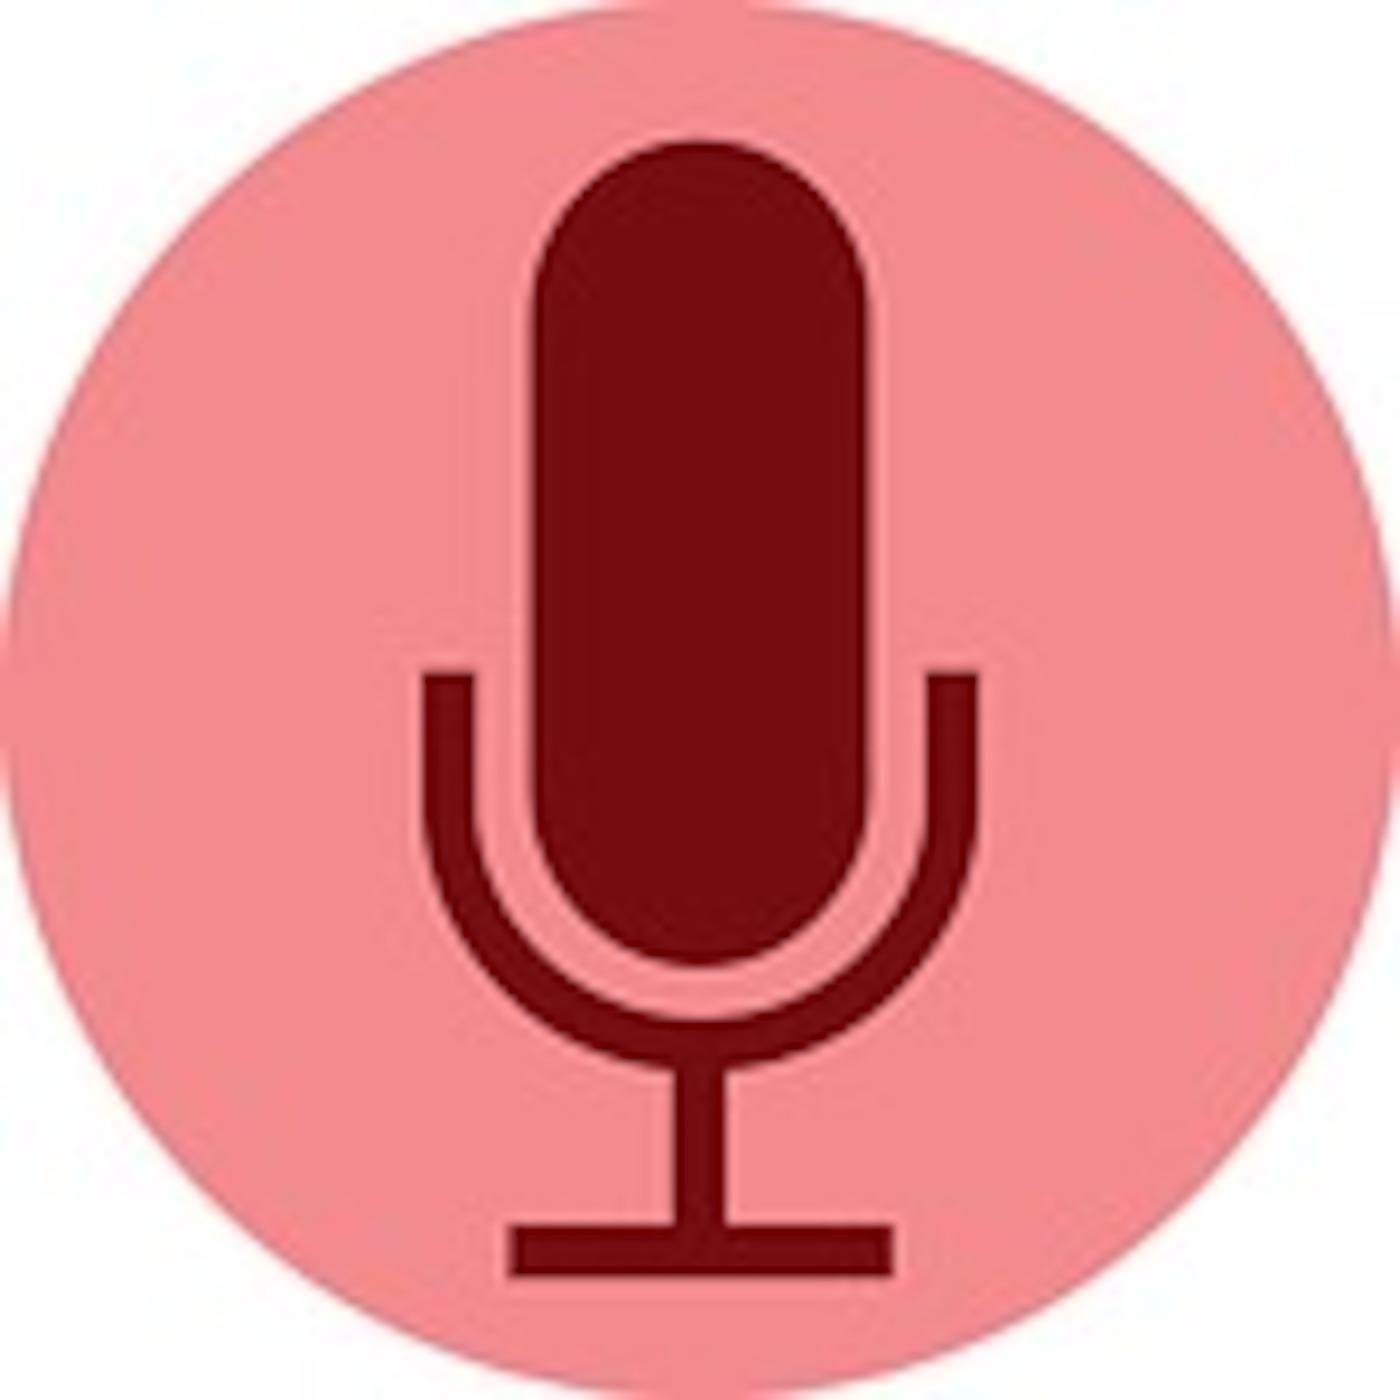 ololmedia's Podcast